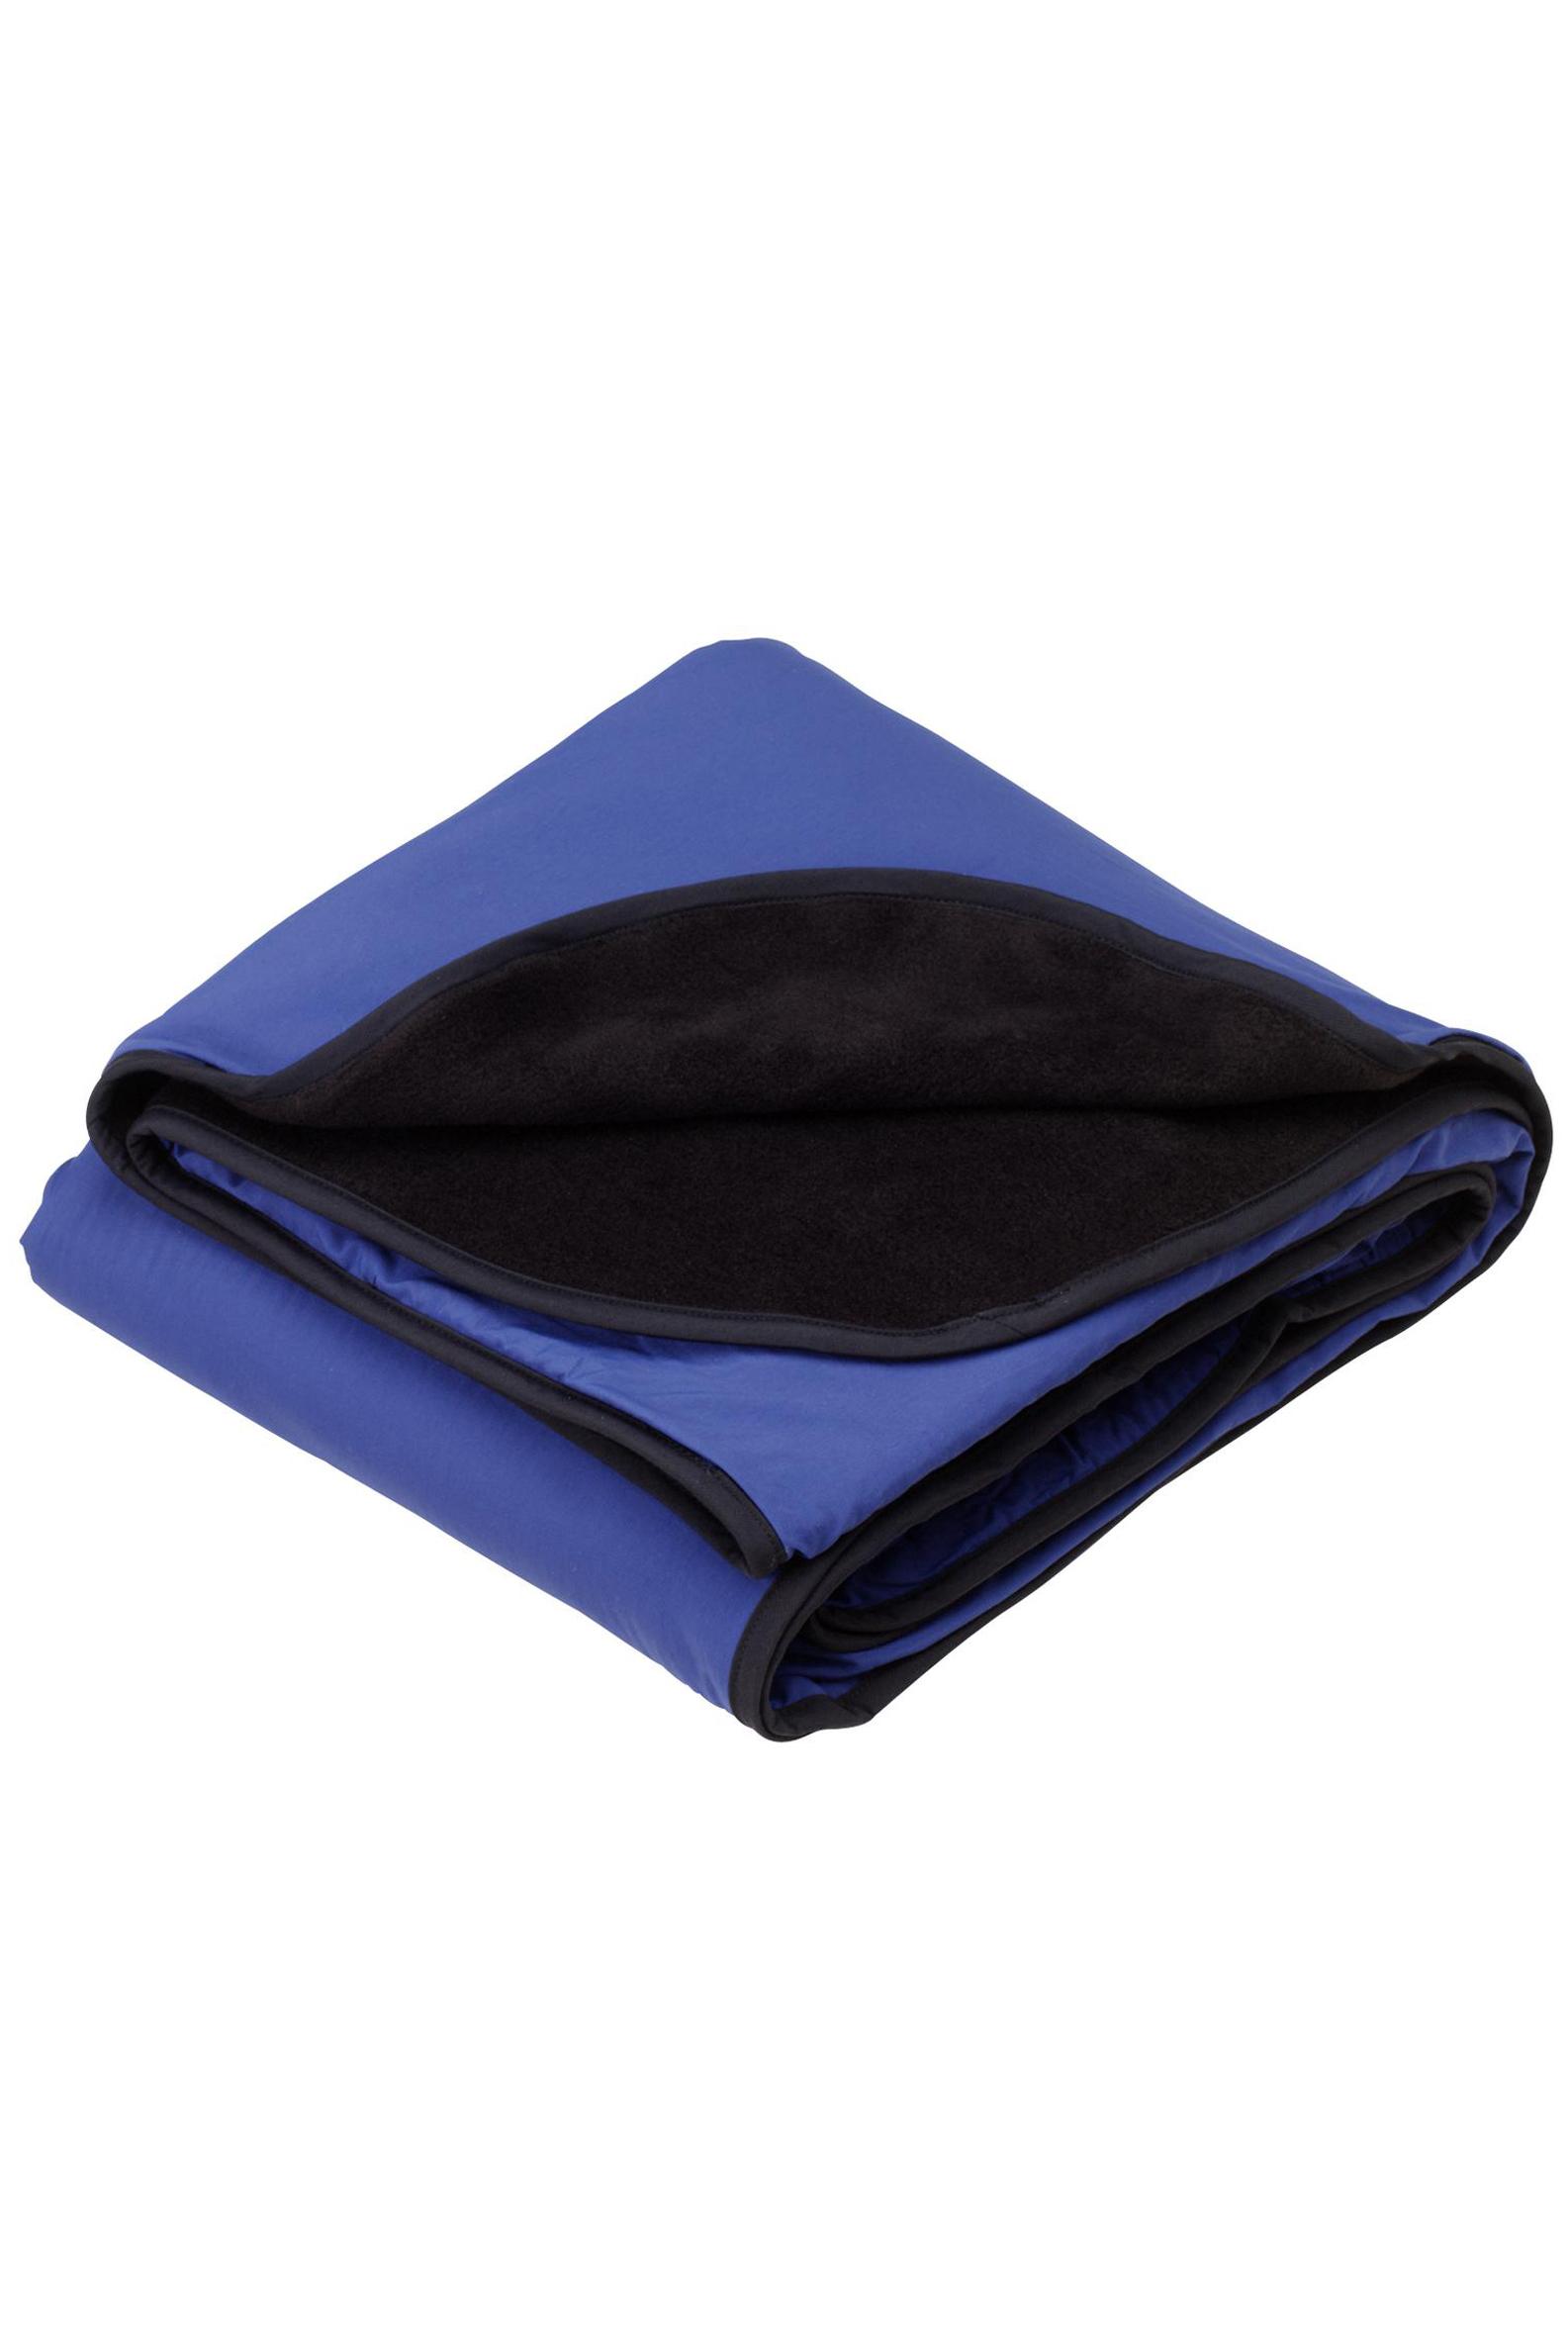 Accessories-Blankets-9